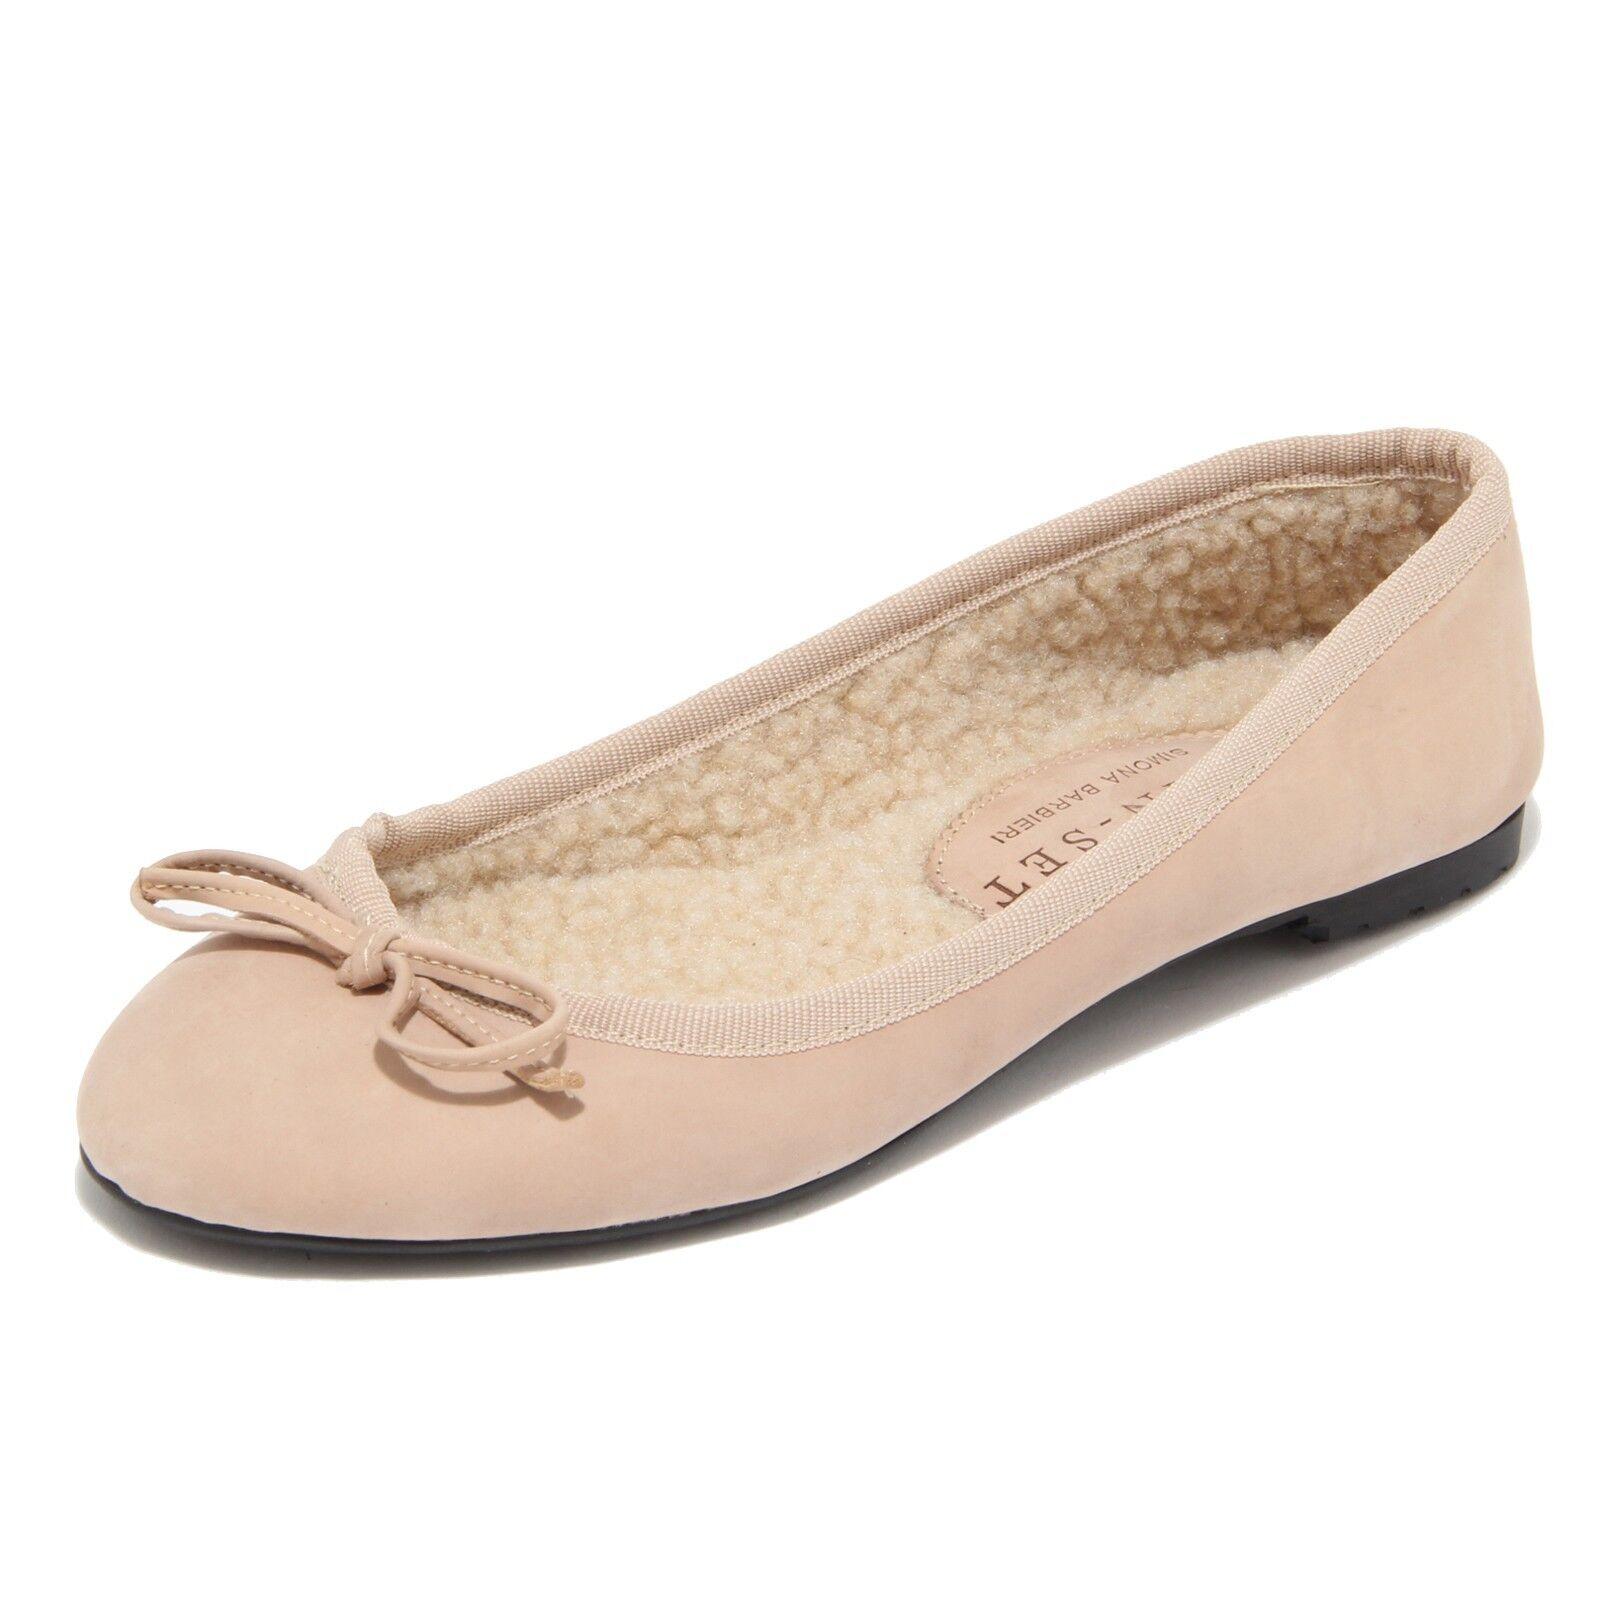 81325 ballerina TWIN-SET SIMONA BARBIERI scarpa donna scarpe donna | Moda Attraente  | Sig/Sig Ra Scarpa